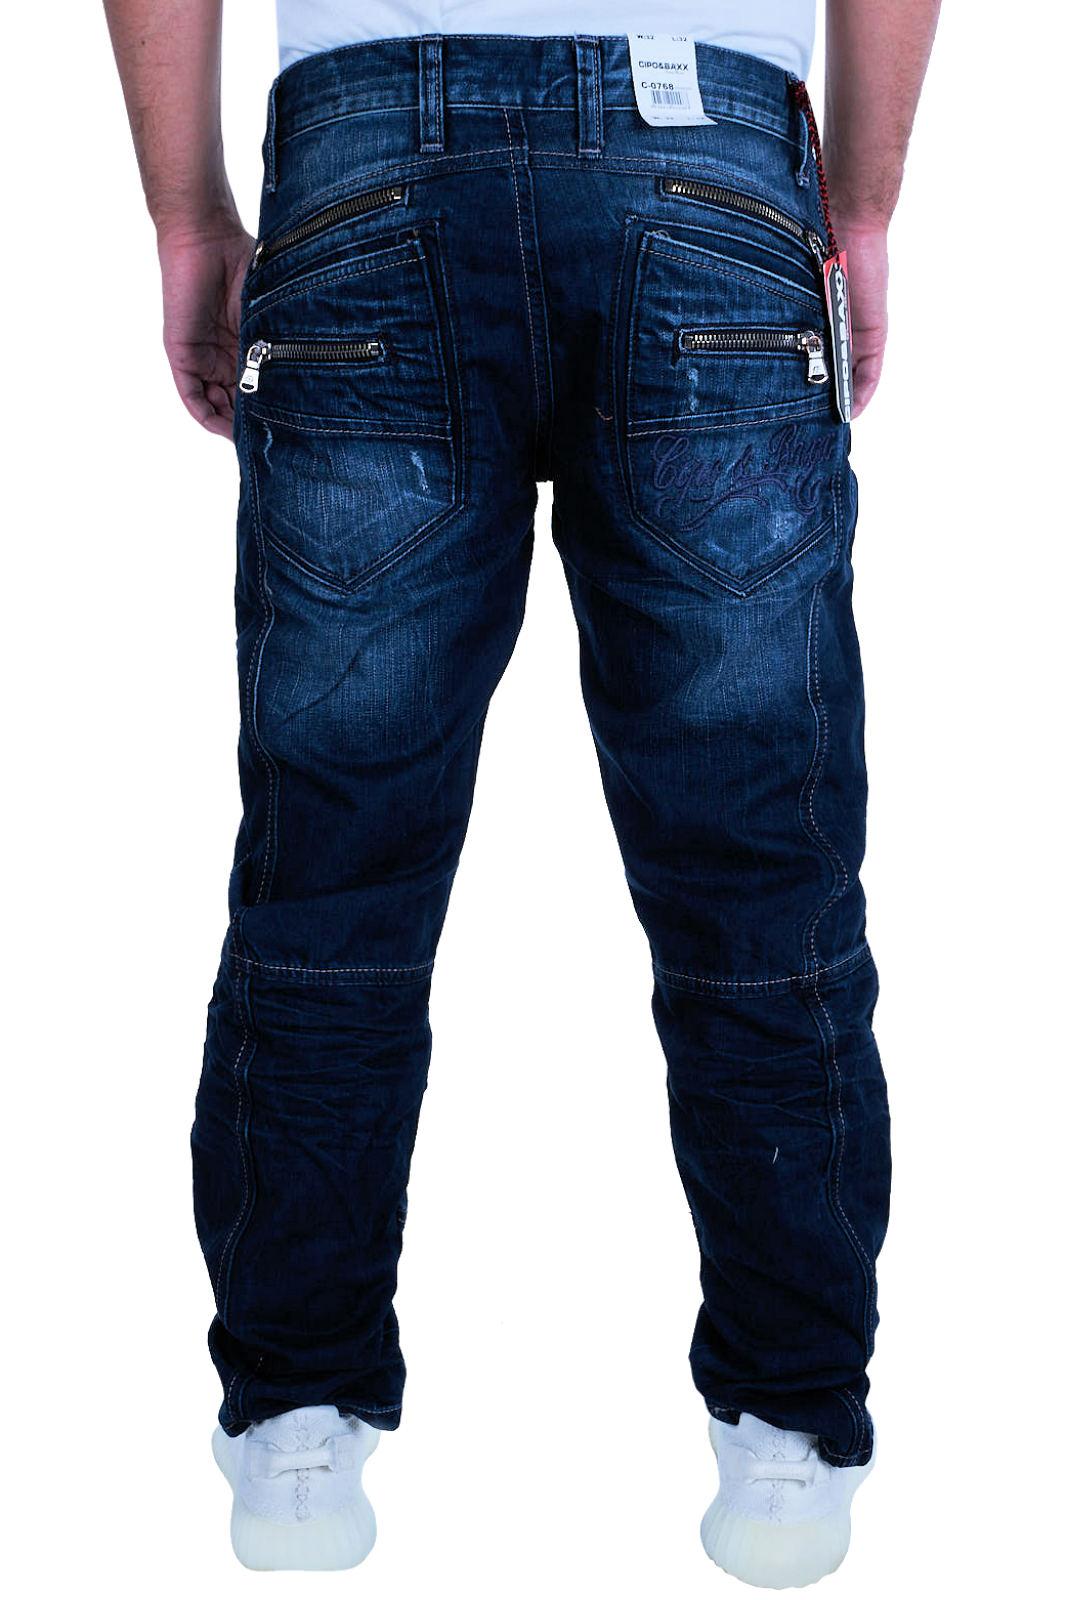 Cipo-amp-Baxx-Mens-Jeans-Clubwear-Denim-Trousers-c-0768-Straight-Designer-New-C-0768 thumbnail 3